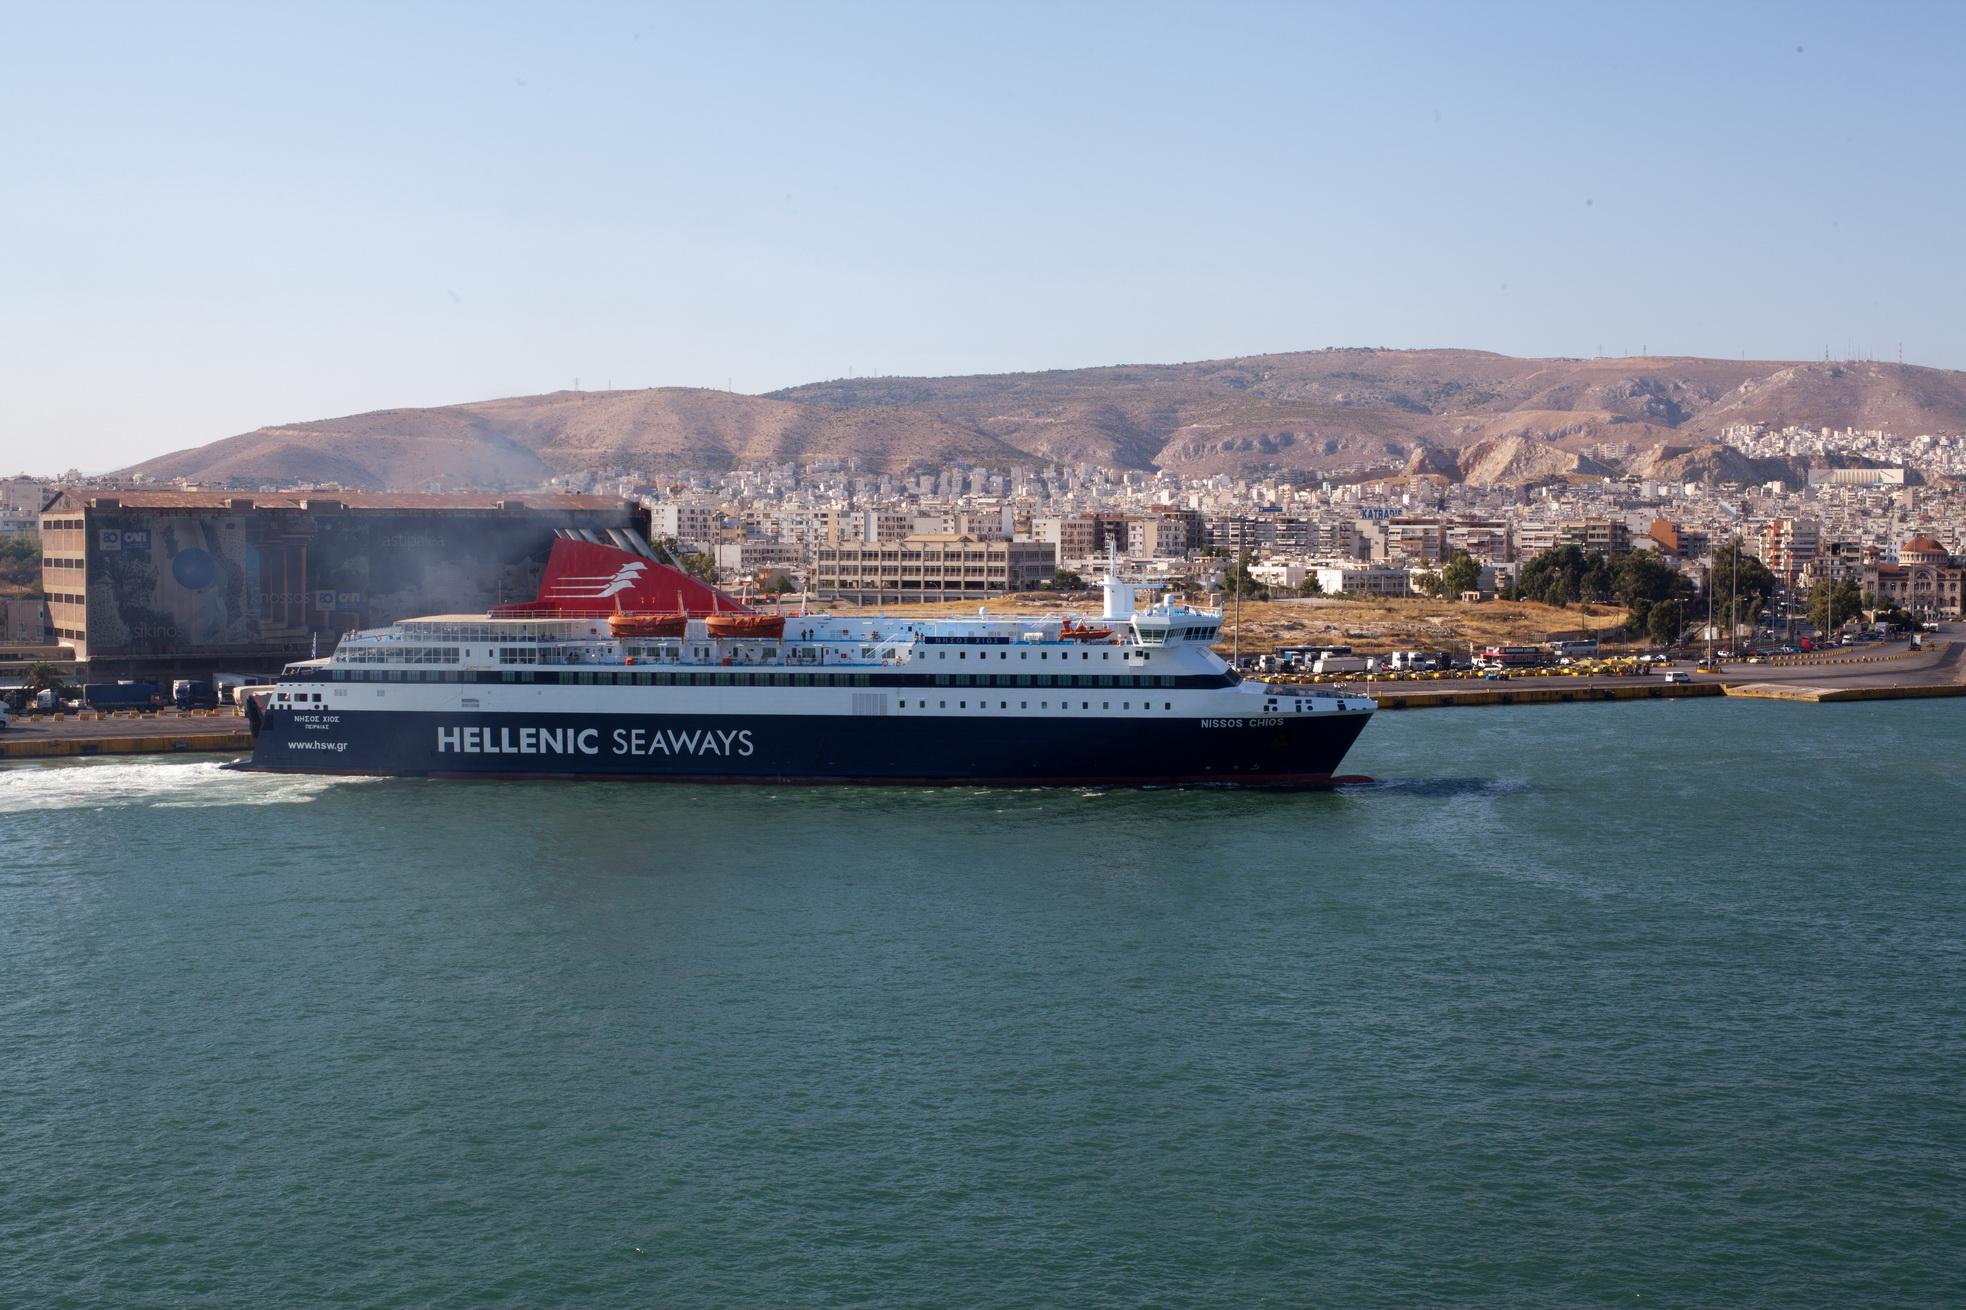 MS Nissos Chios IMO 9215555 Hellenic Seaways docking Piraeus Port of Athens Greece 04